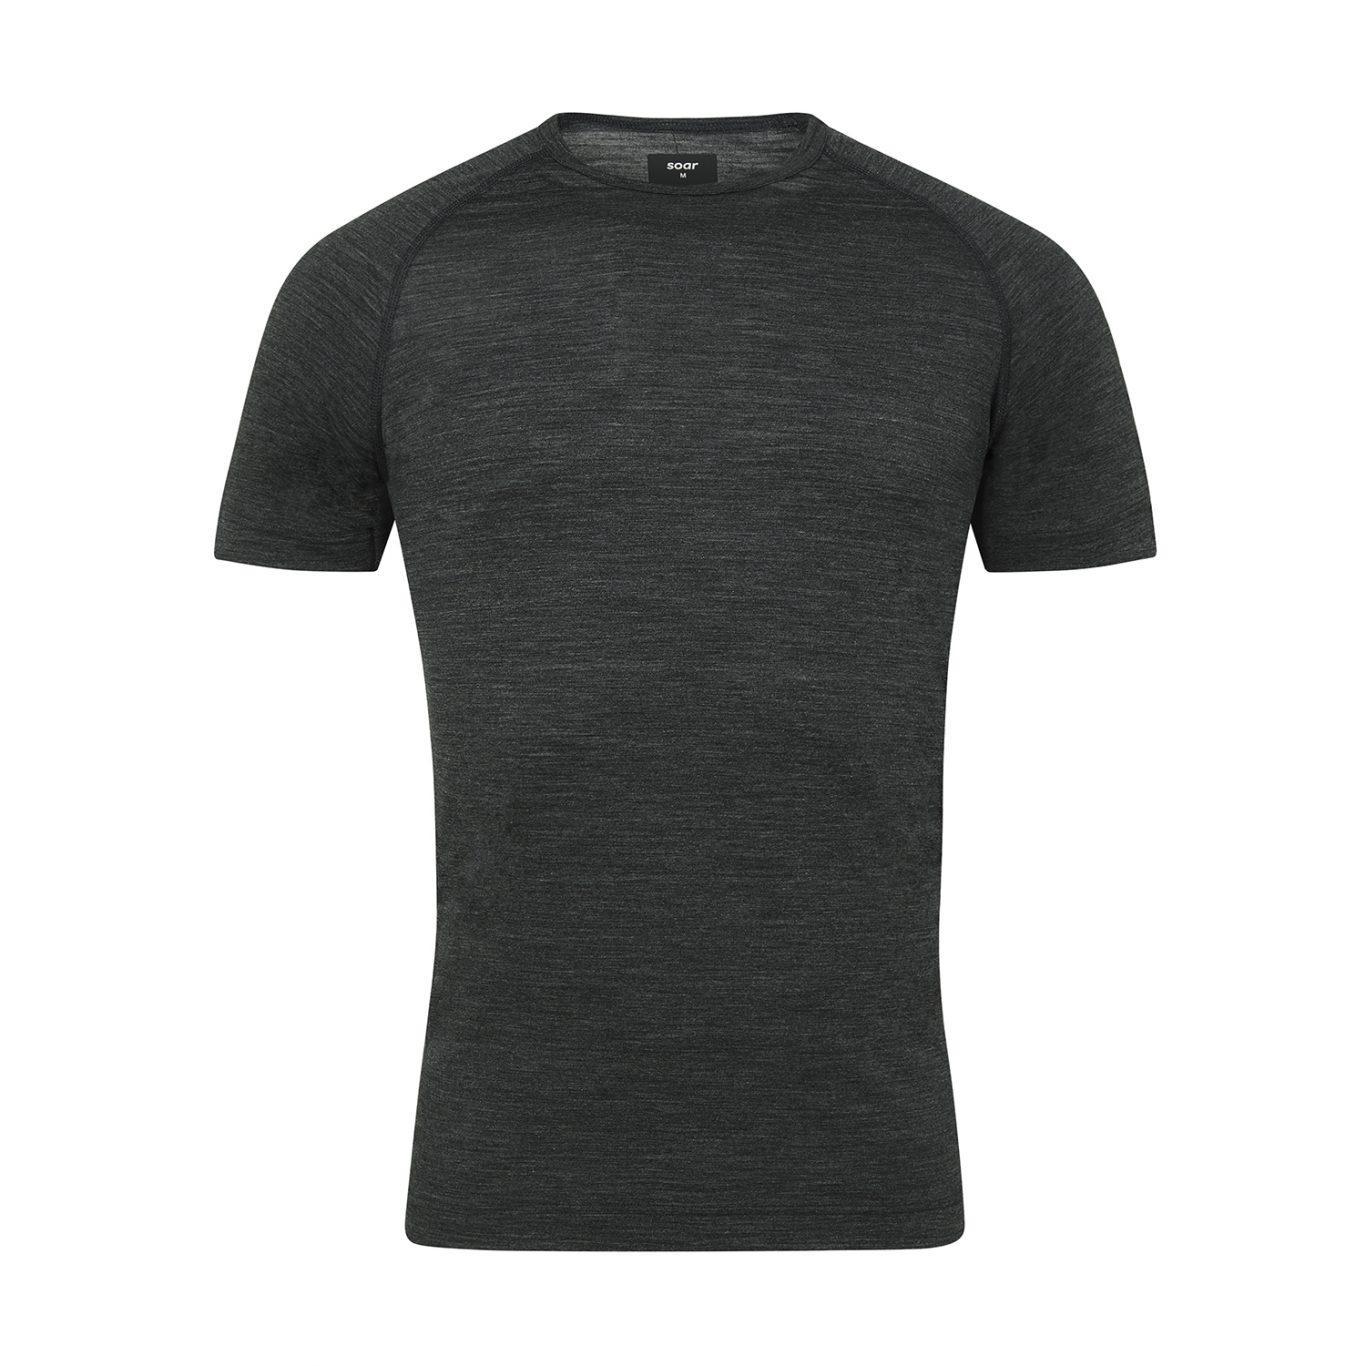 (c) Soar Merino & Silk T-Shirt Base